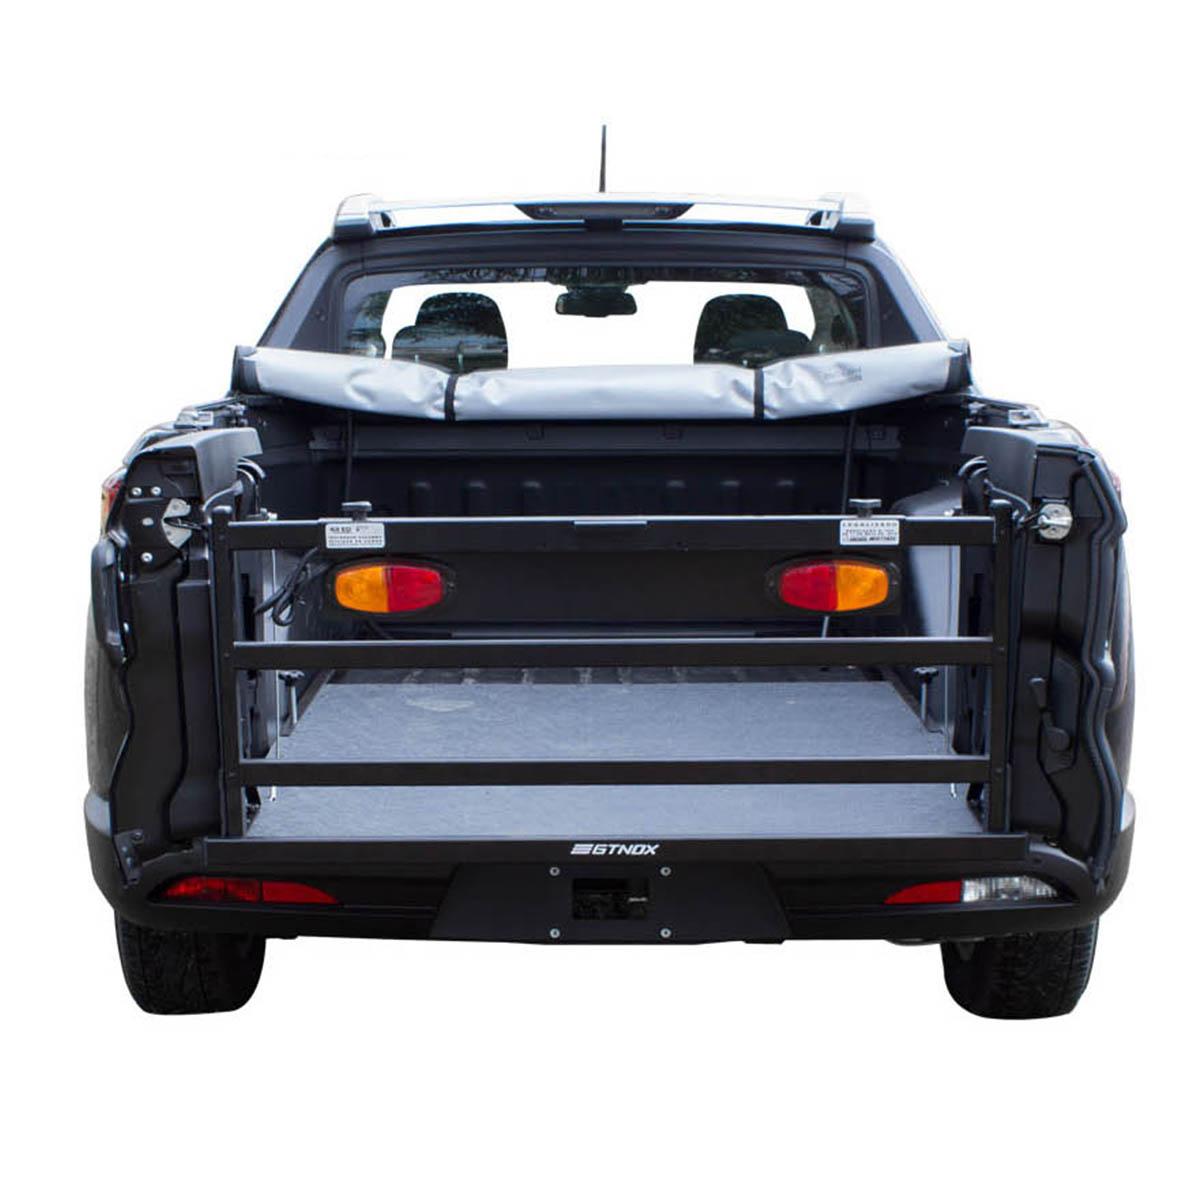 Extensor de caçamba Fiat Toro 2017 2018